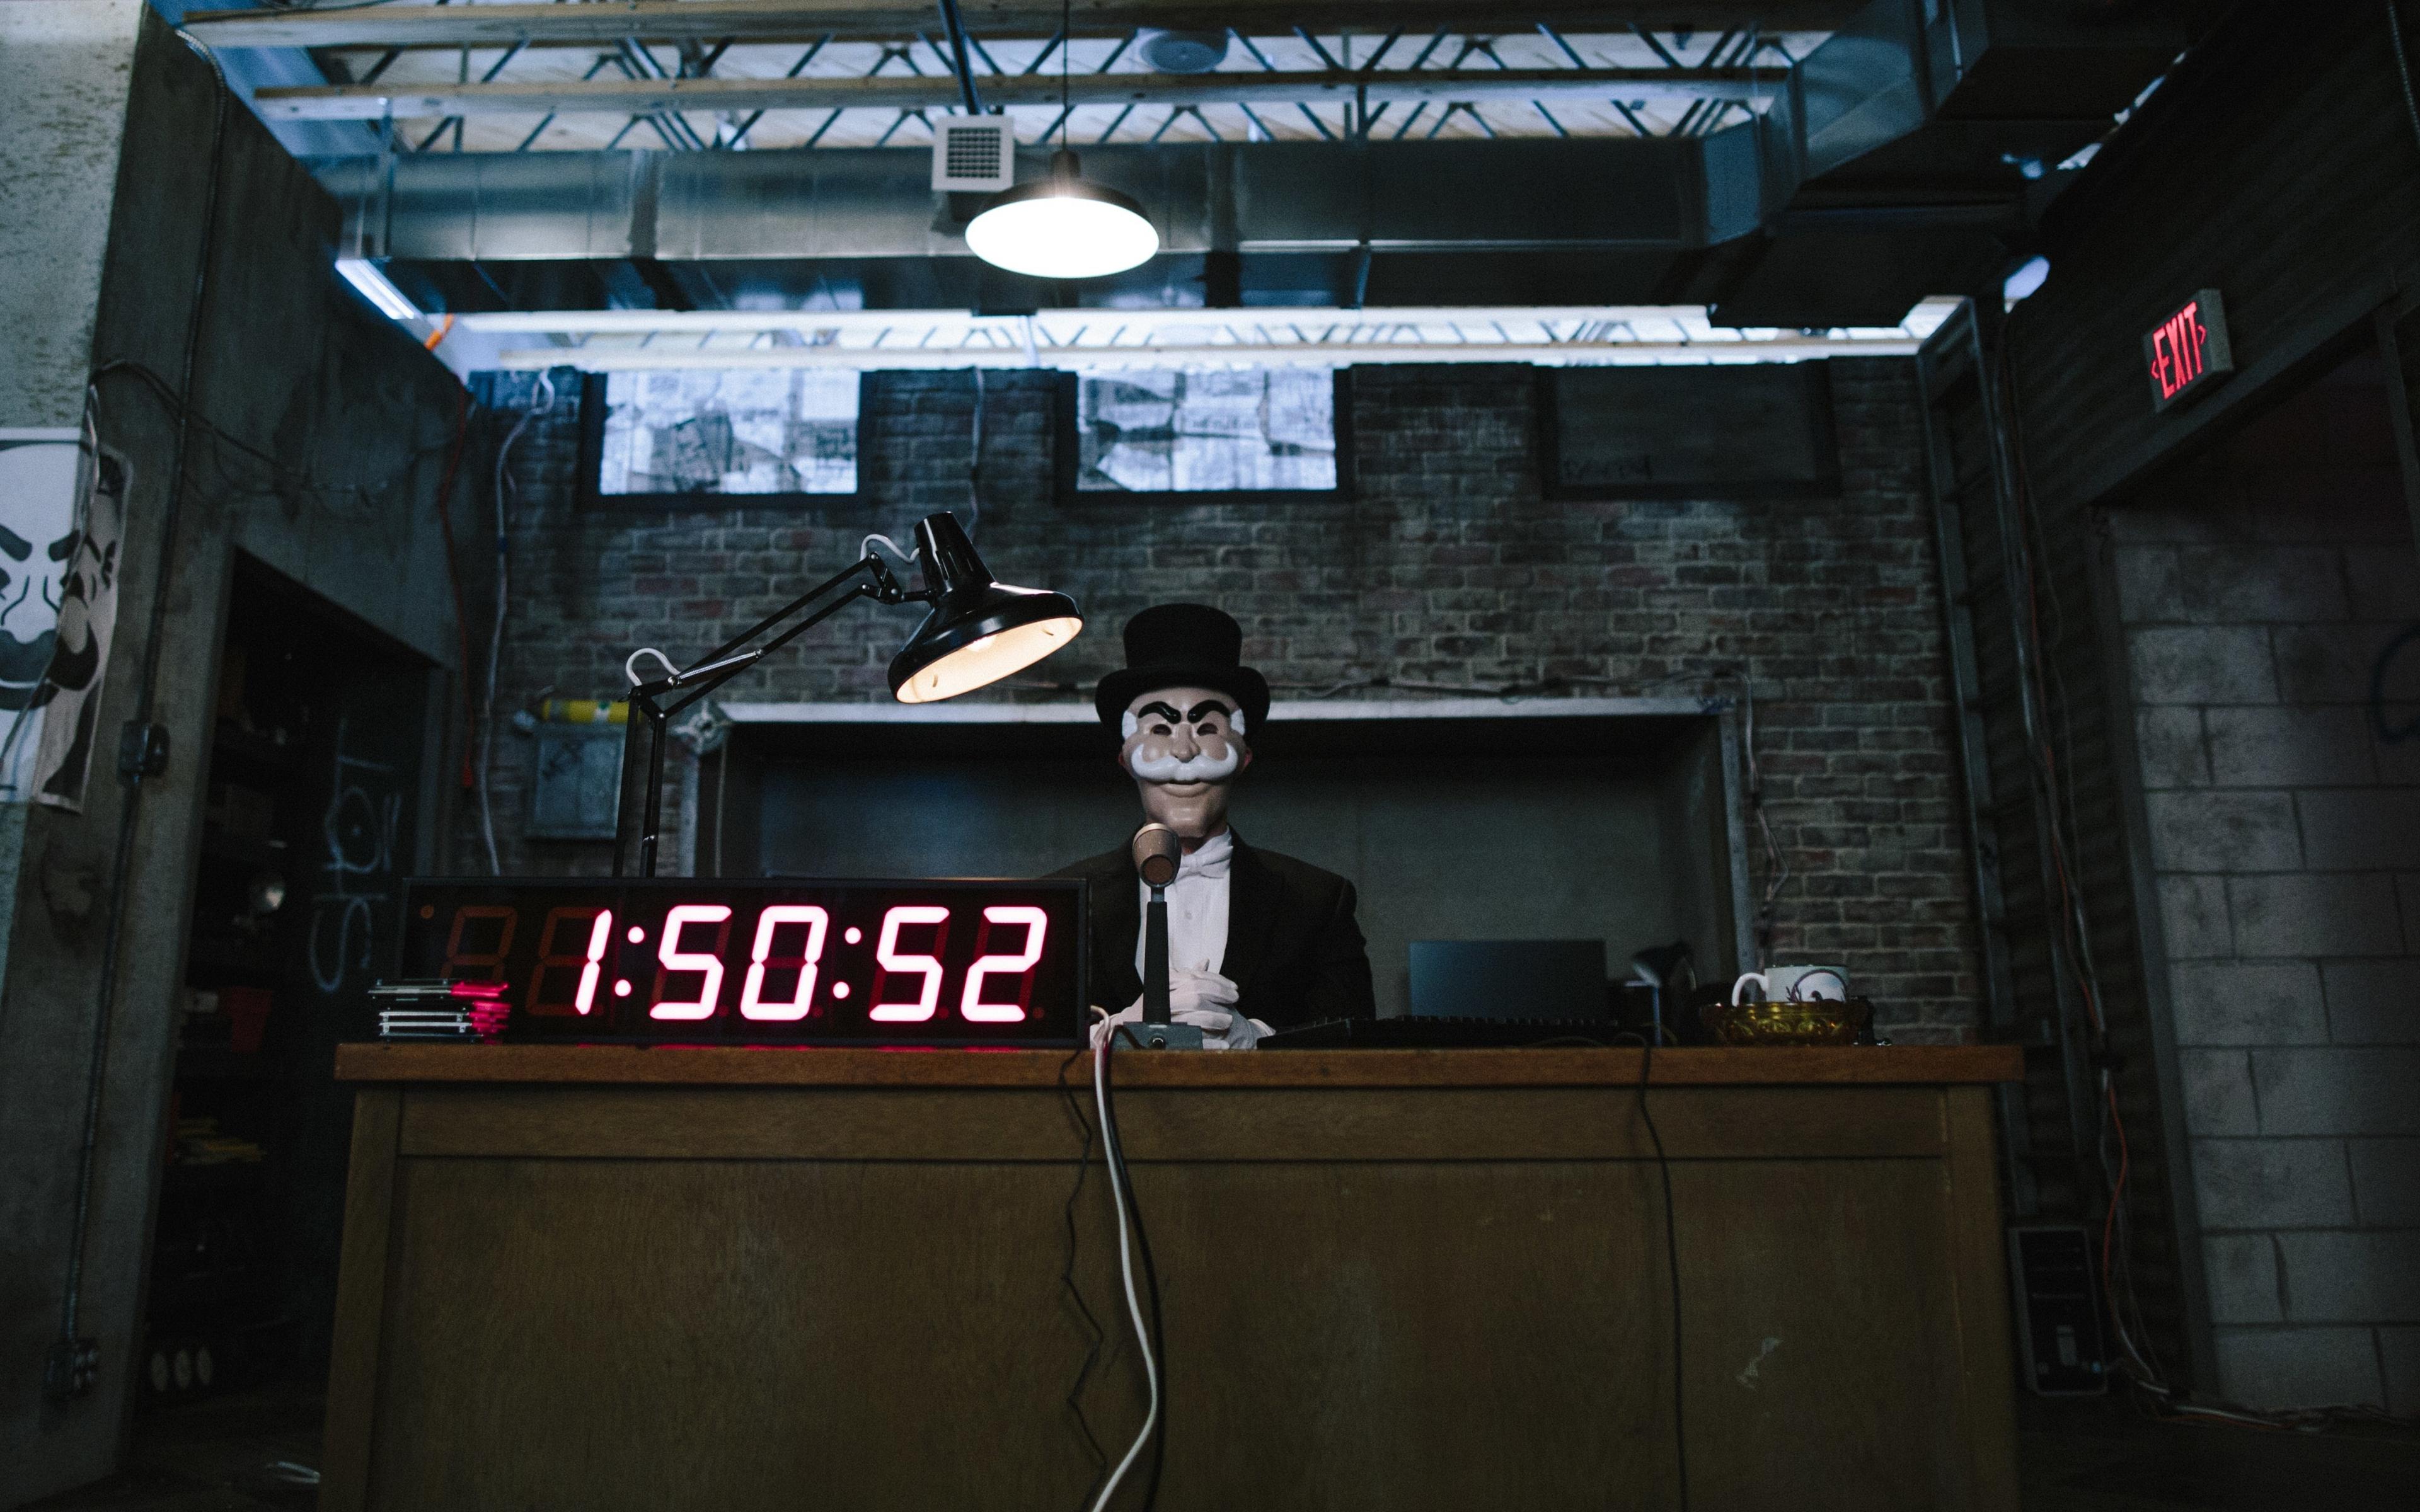 Download 3840x2400 Wallpaper Mr Robot Hacker Season 4 4k Ultra